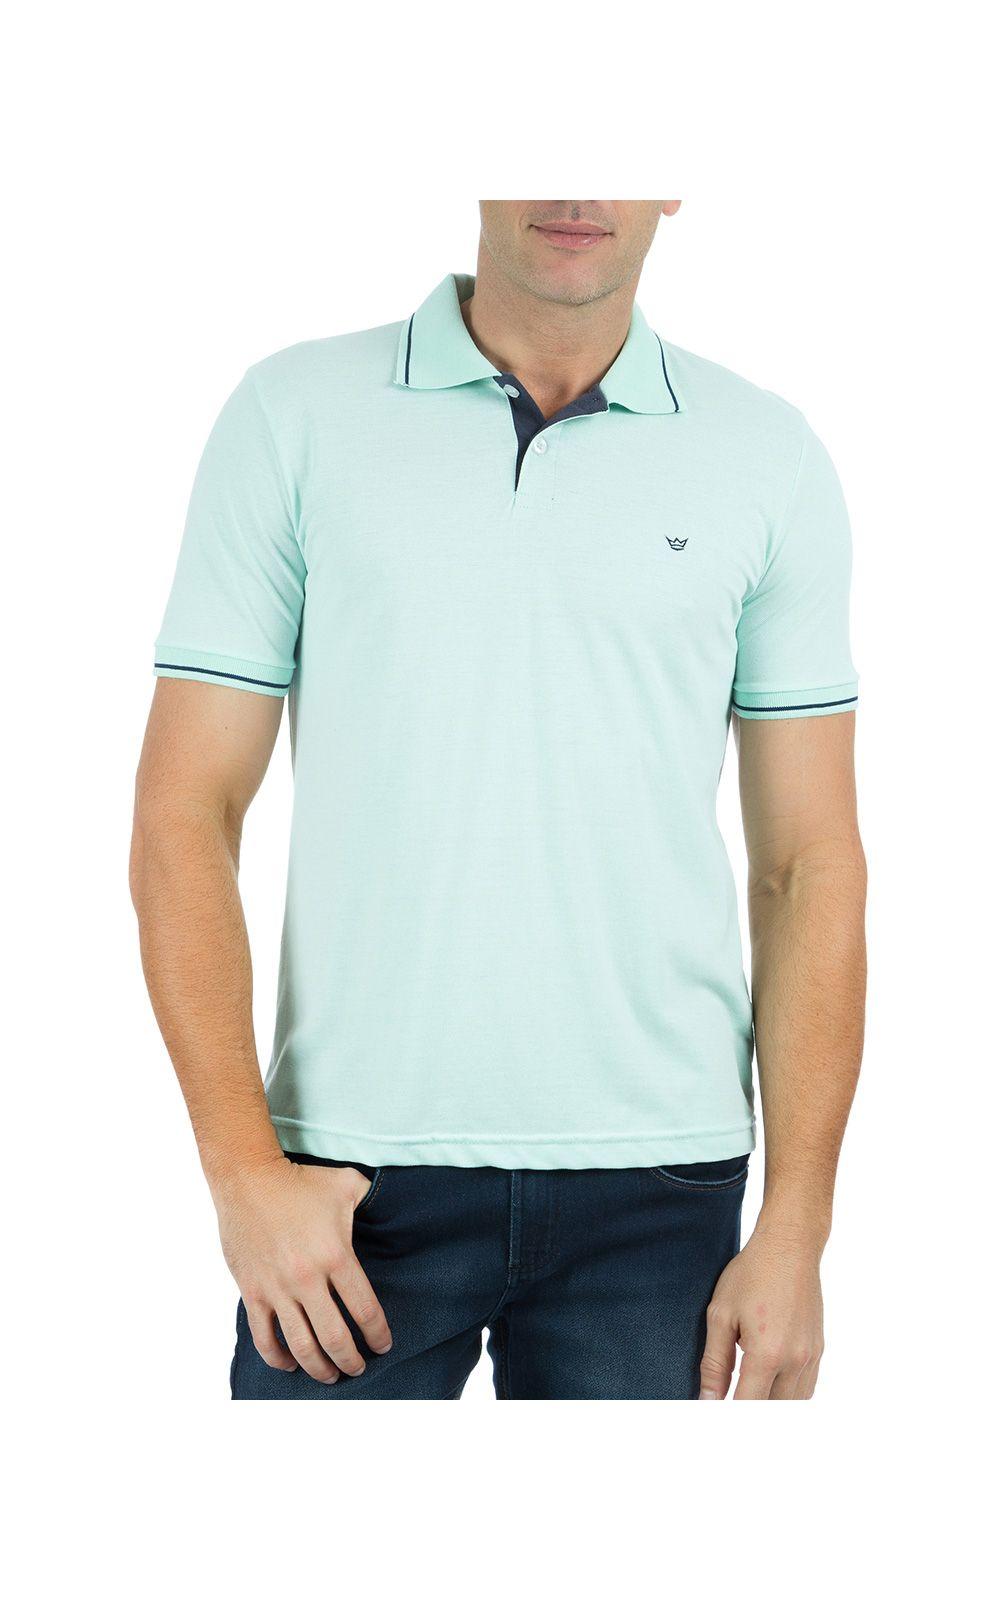 Foto 1 - Camisa Polo Masculina Verde Detalhada